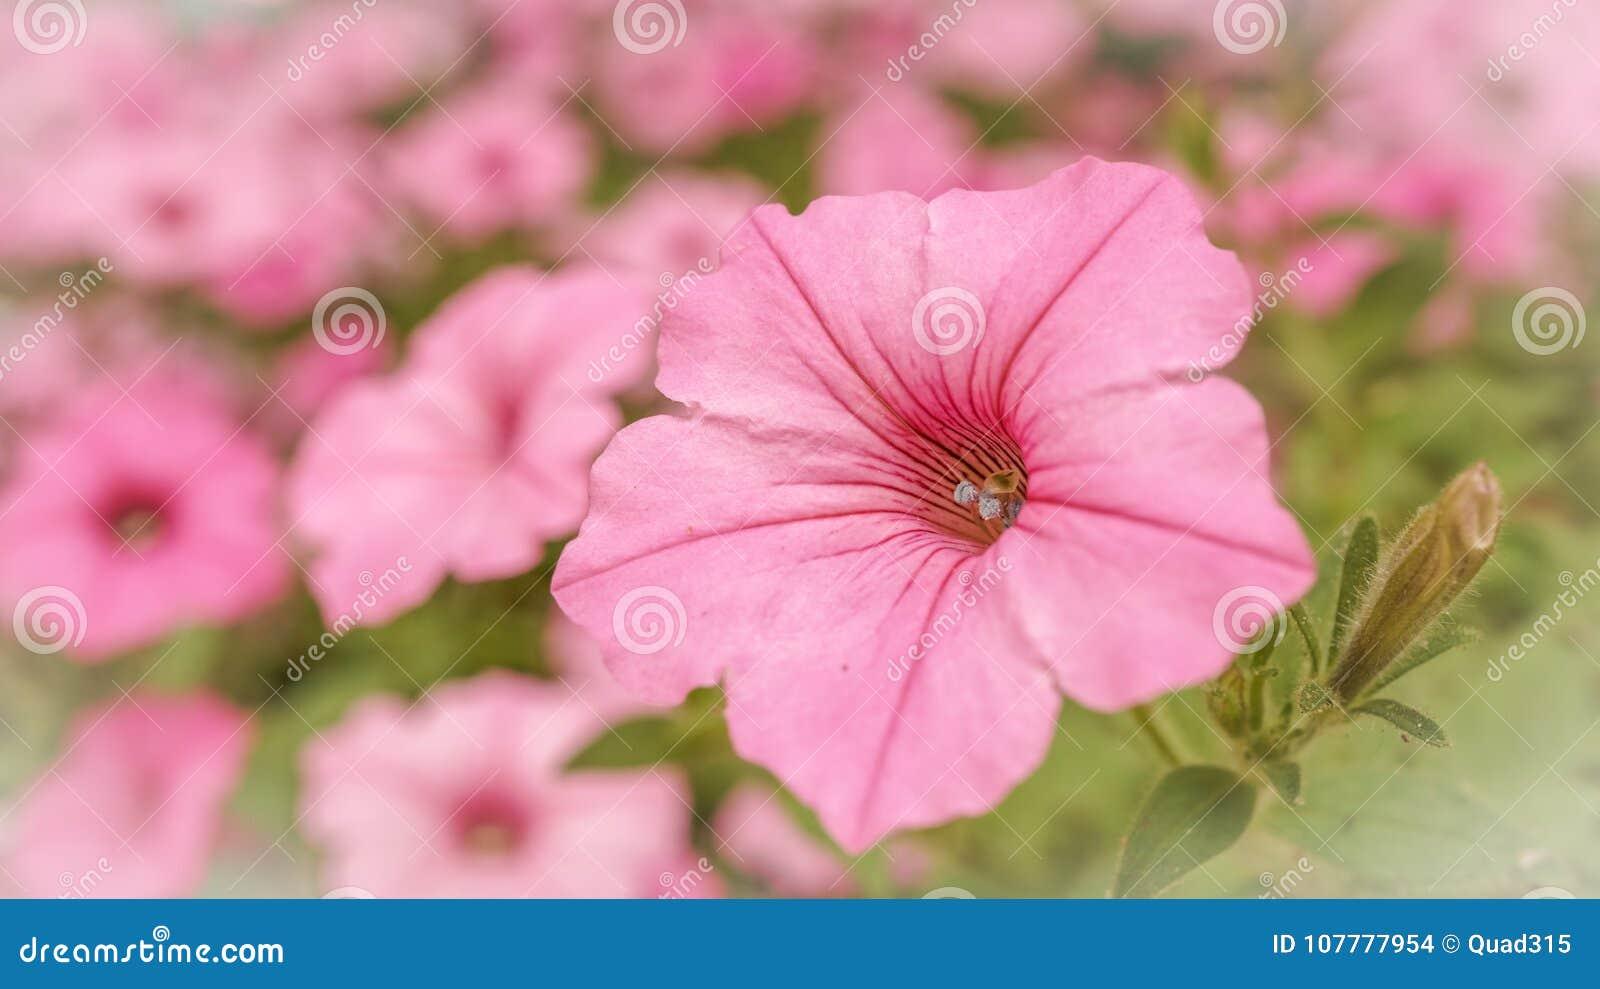 Field Of Pink In A Flower Garden Stock Photo Image Of Pollen